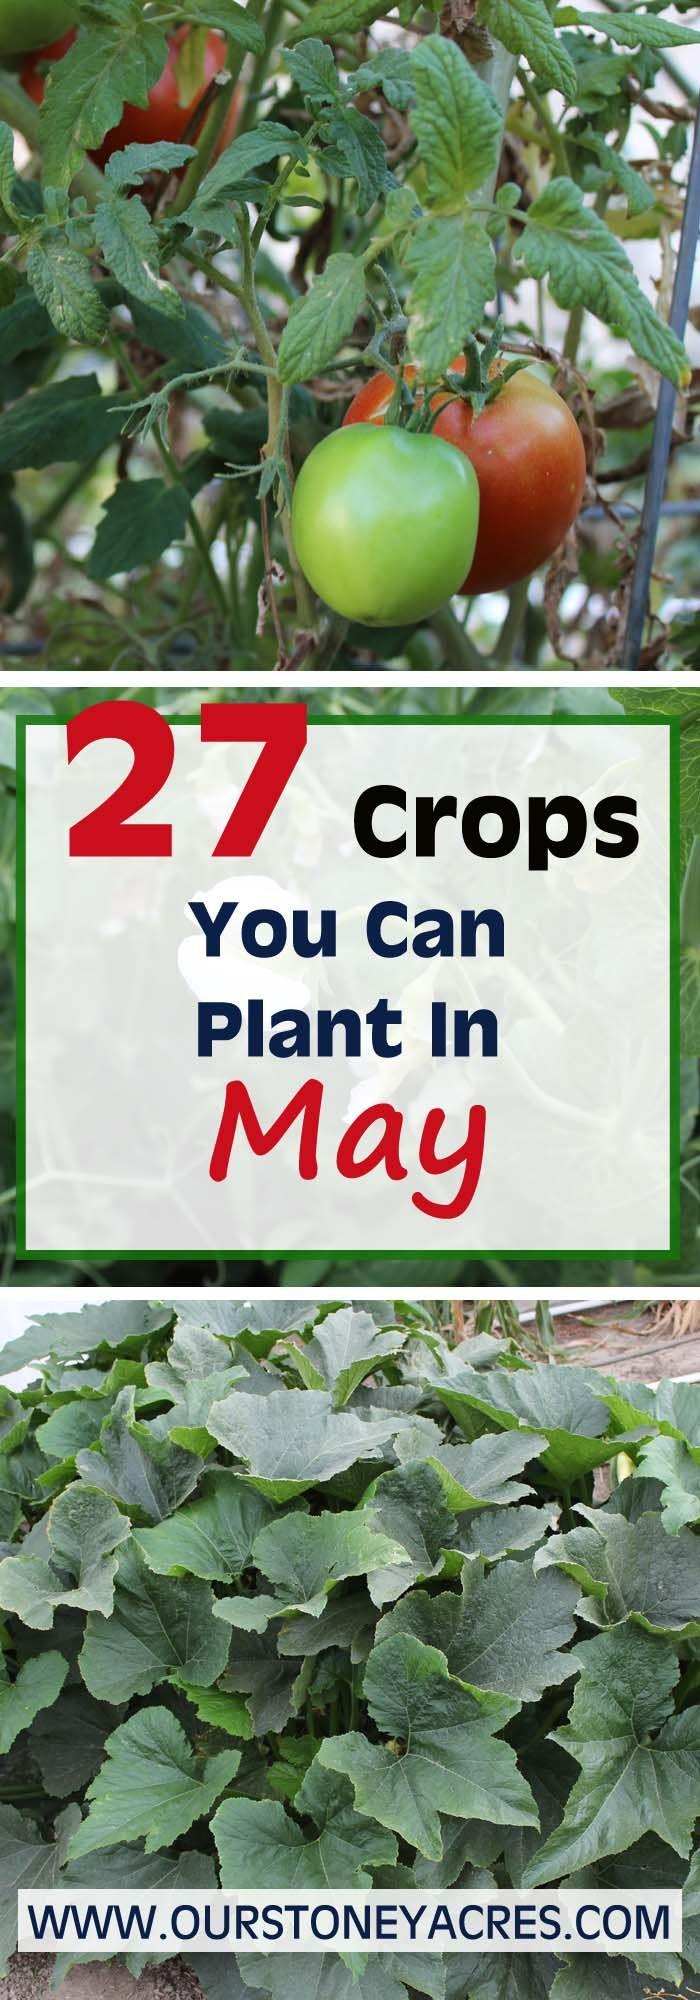 693 best Gardening with Kids images on Pinterest | Gardening tips ...